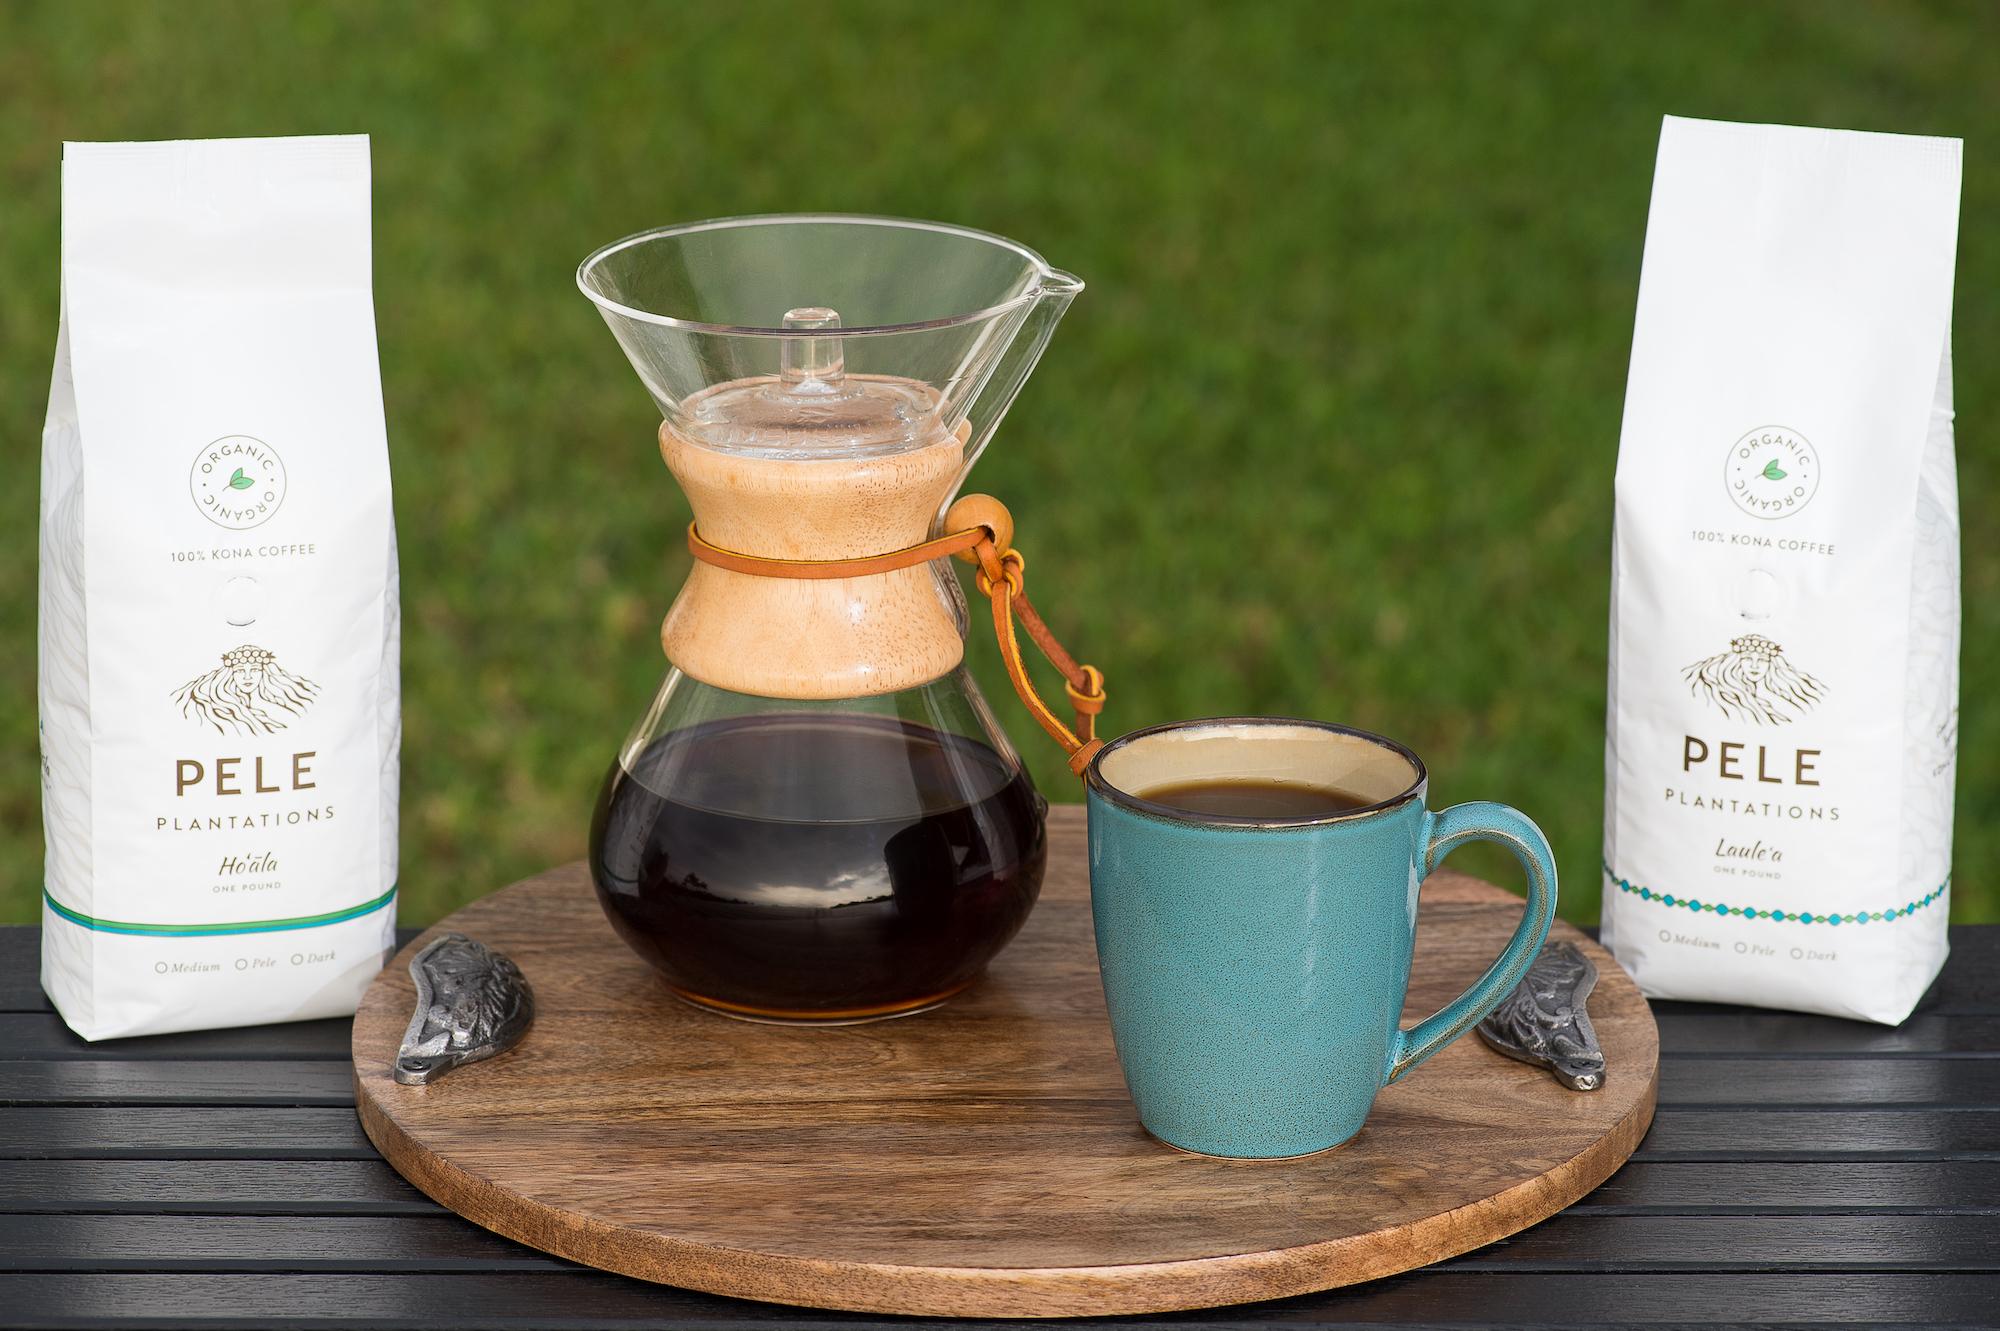 Pele Plantations Offers Private Kona Coffee Farm Tours